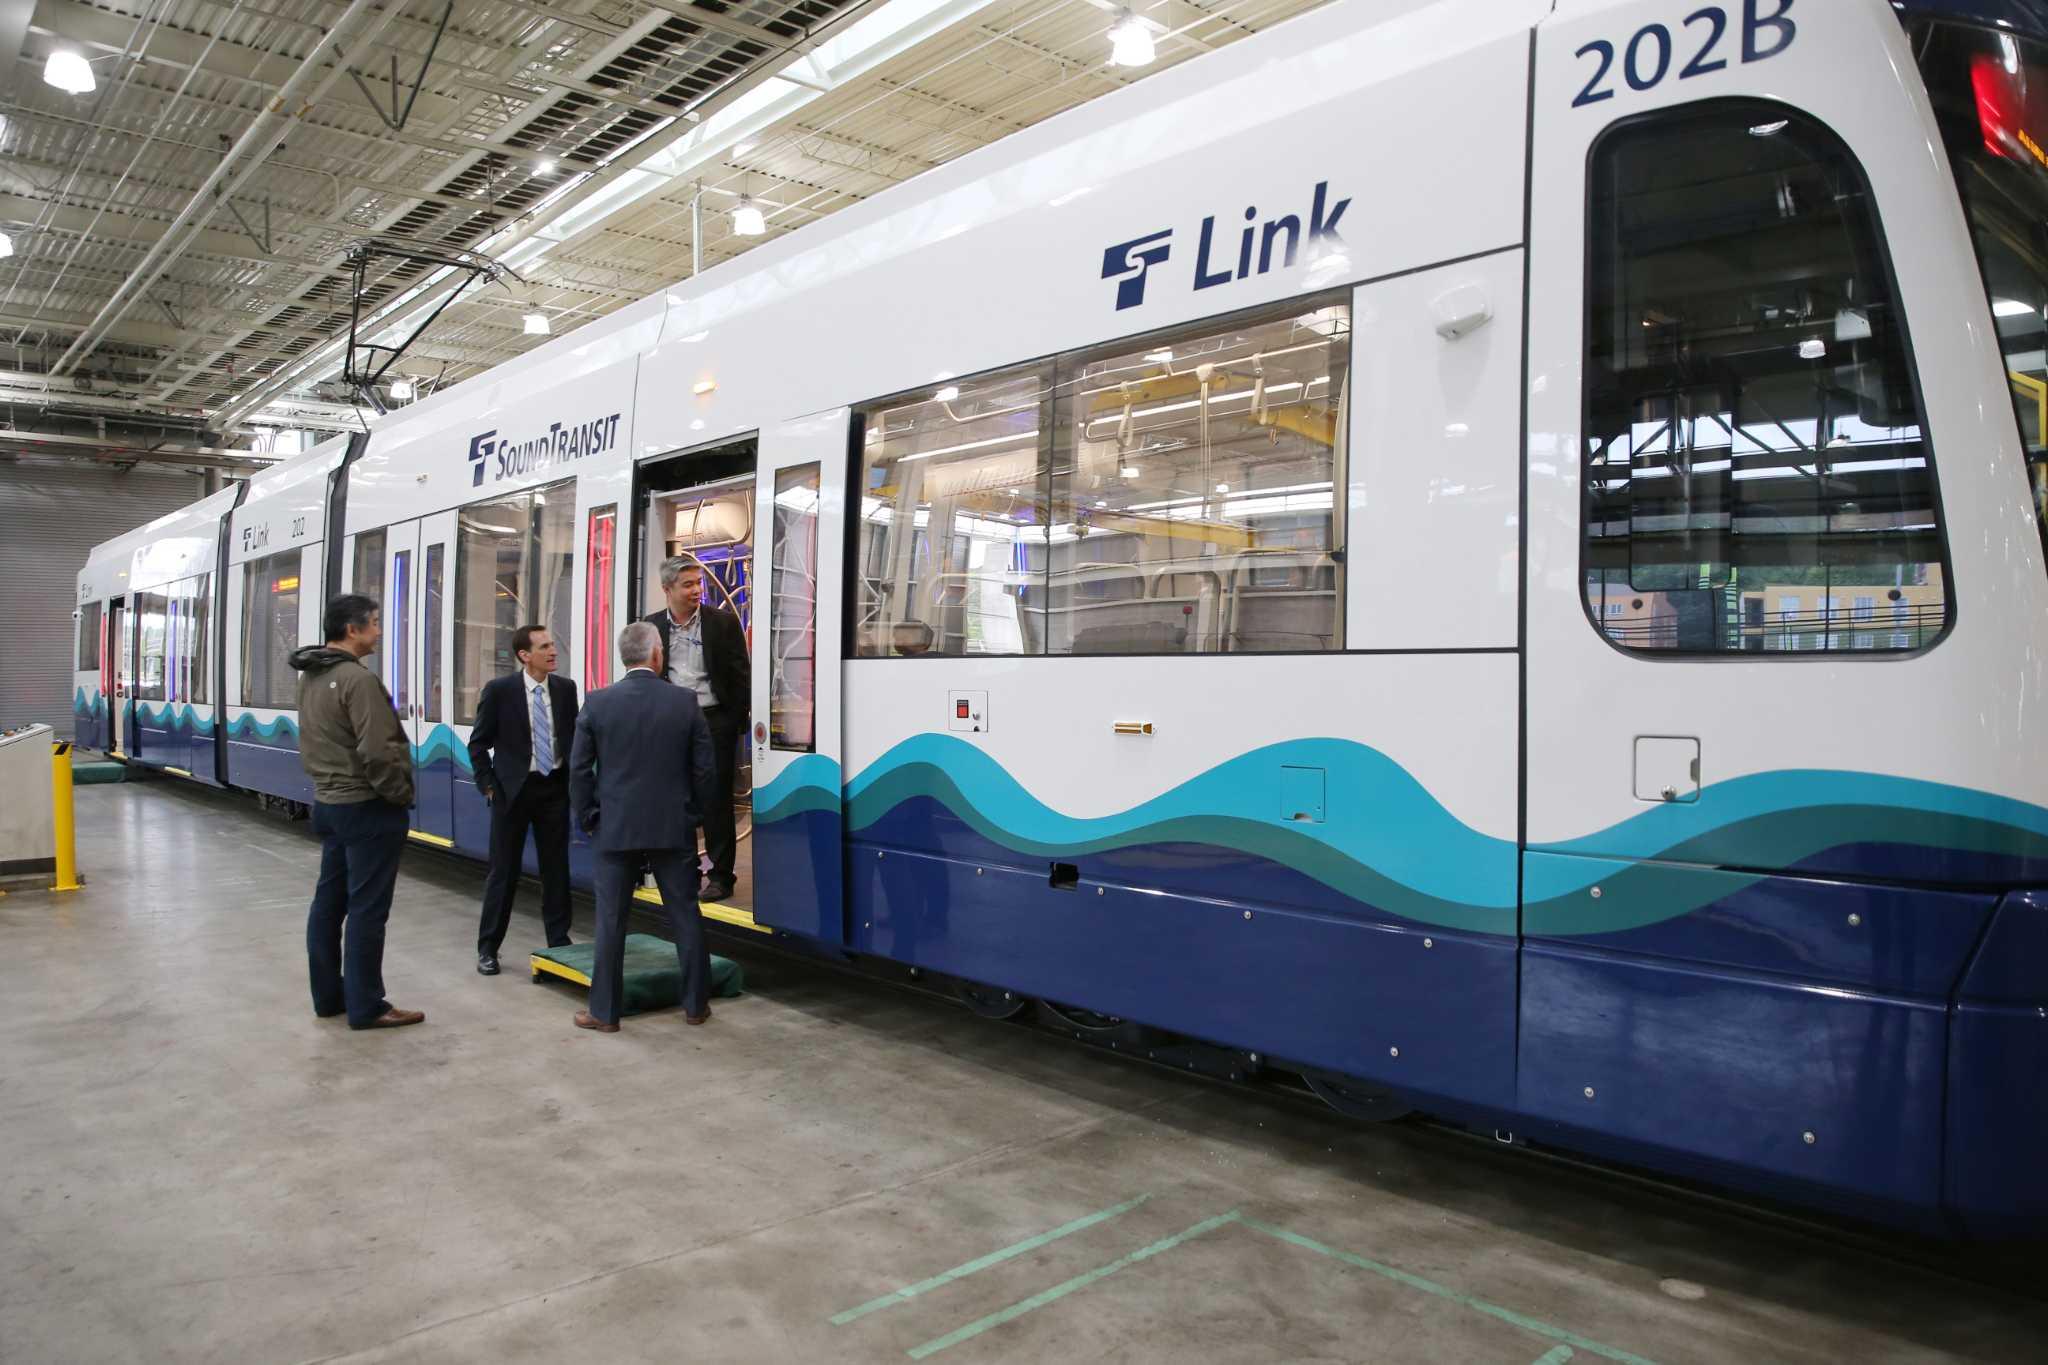 Sound Transit: vandalism to delay Link trains until Thursday